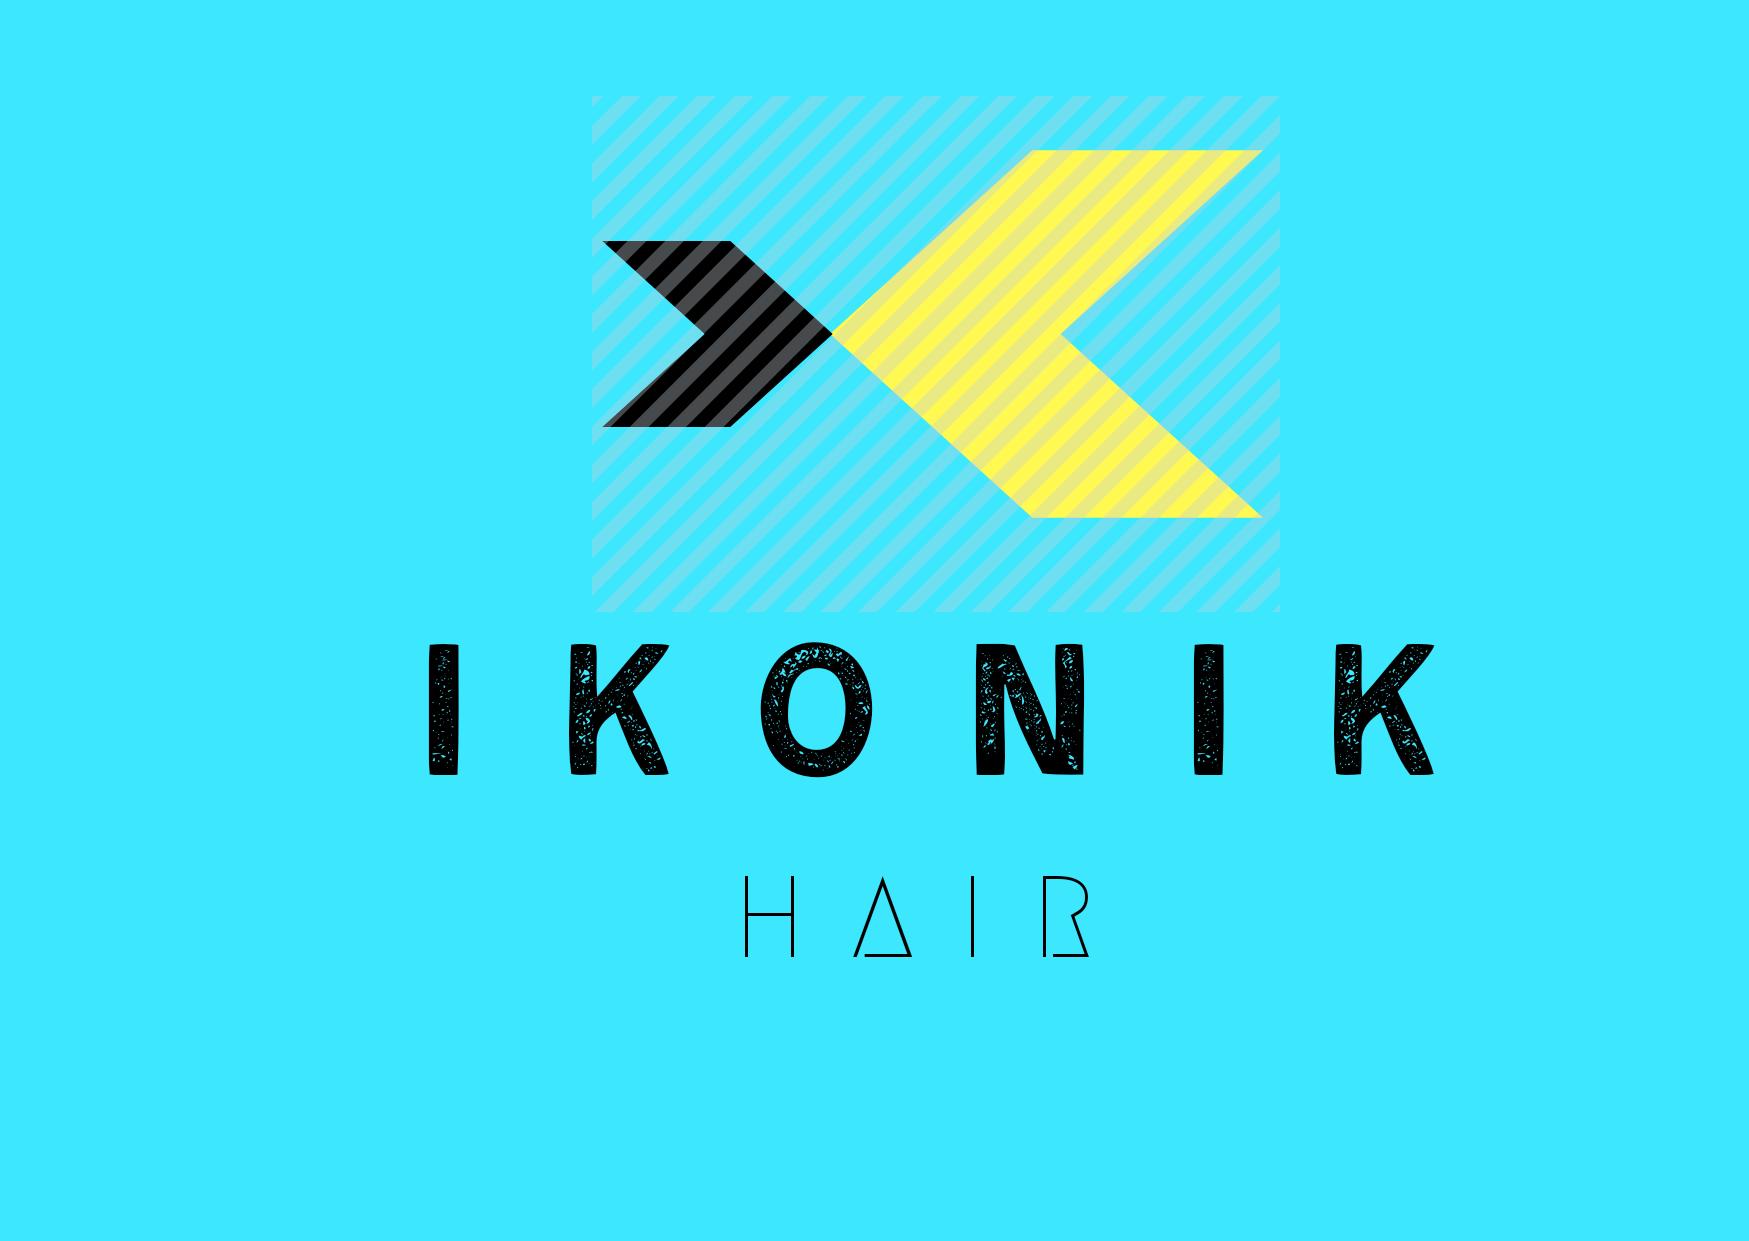 IKONIK HAIR LTD